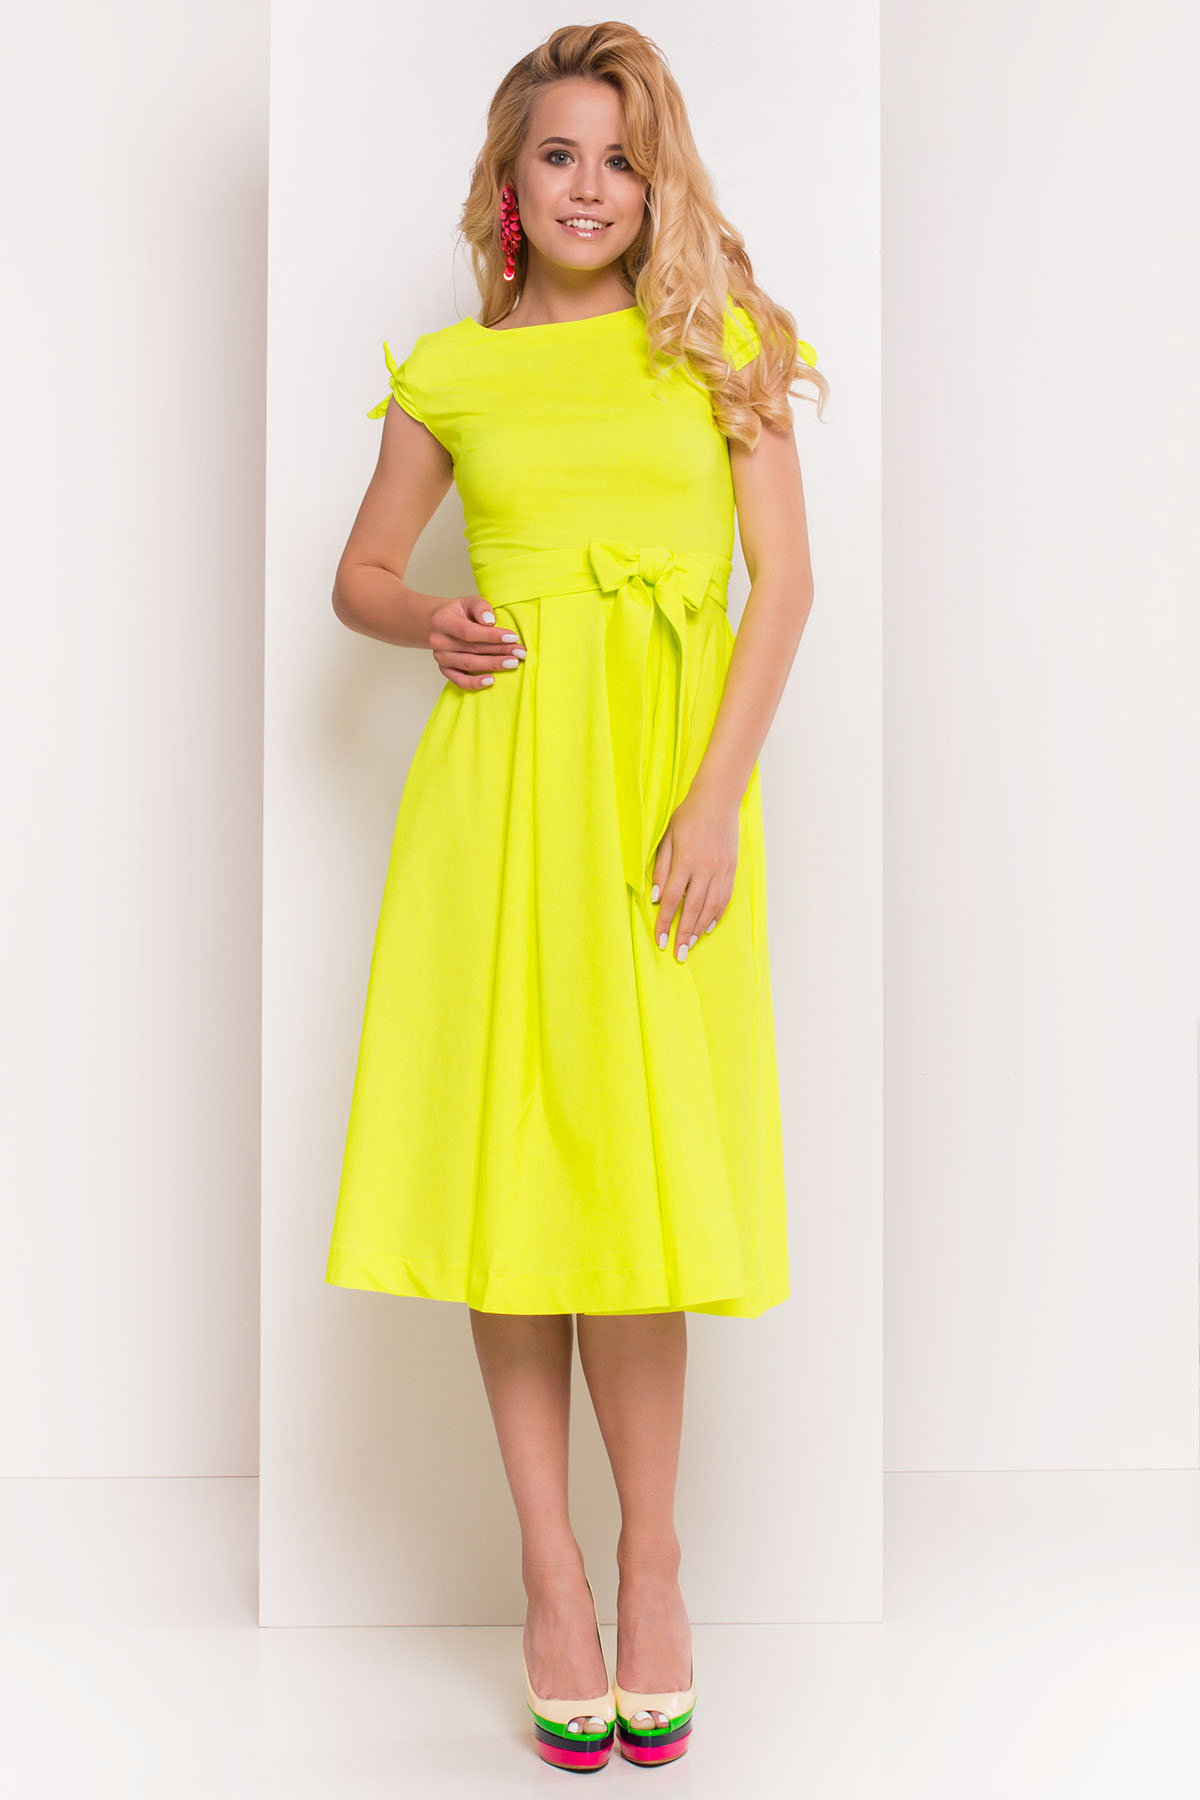 Платье Жадор 5125 Цвет: Лимон неон